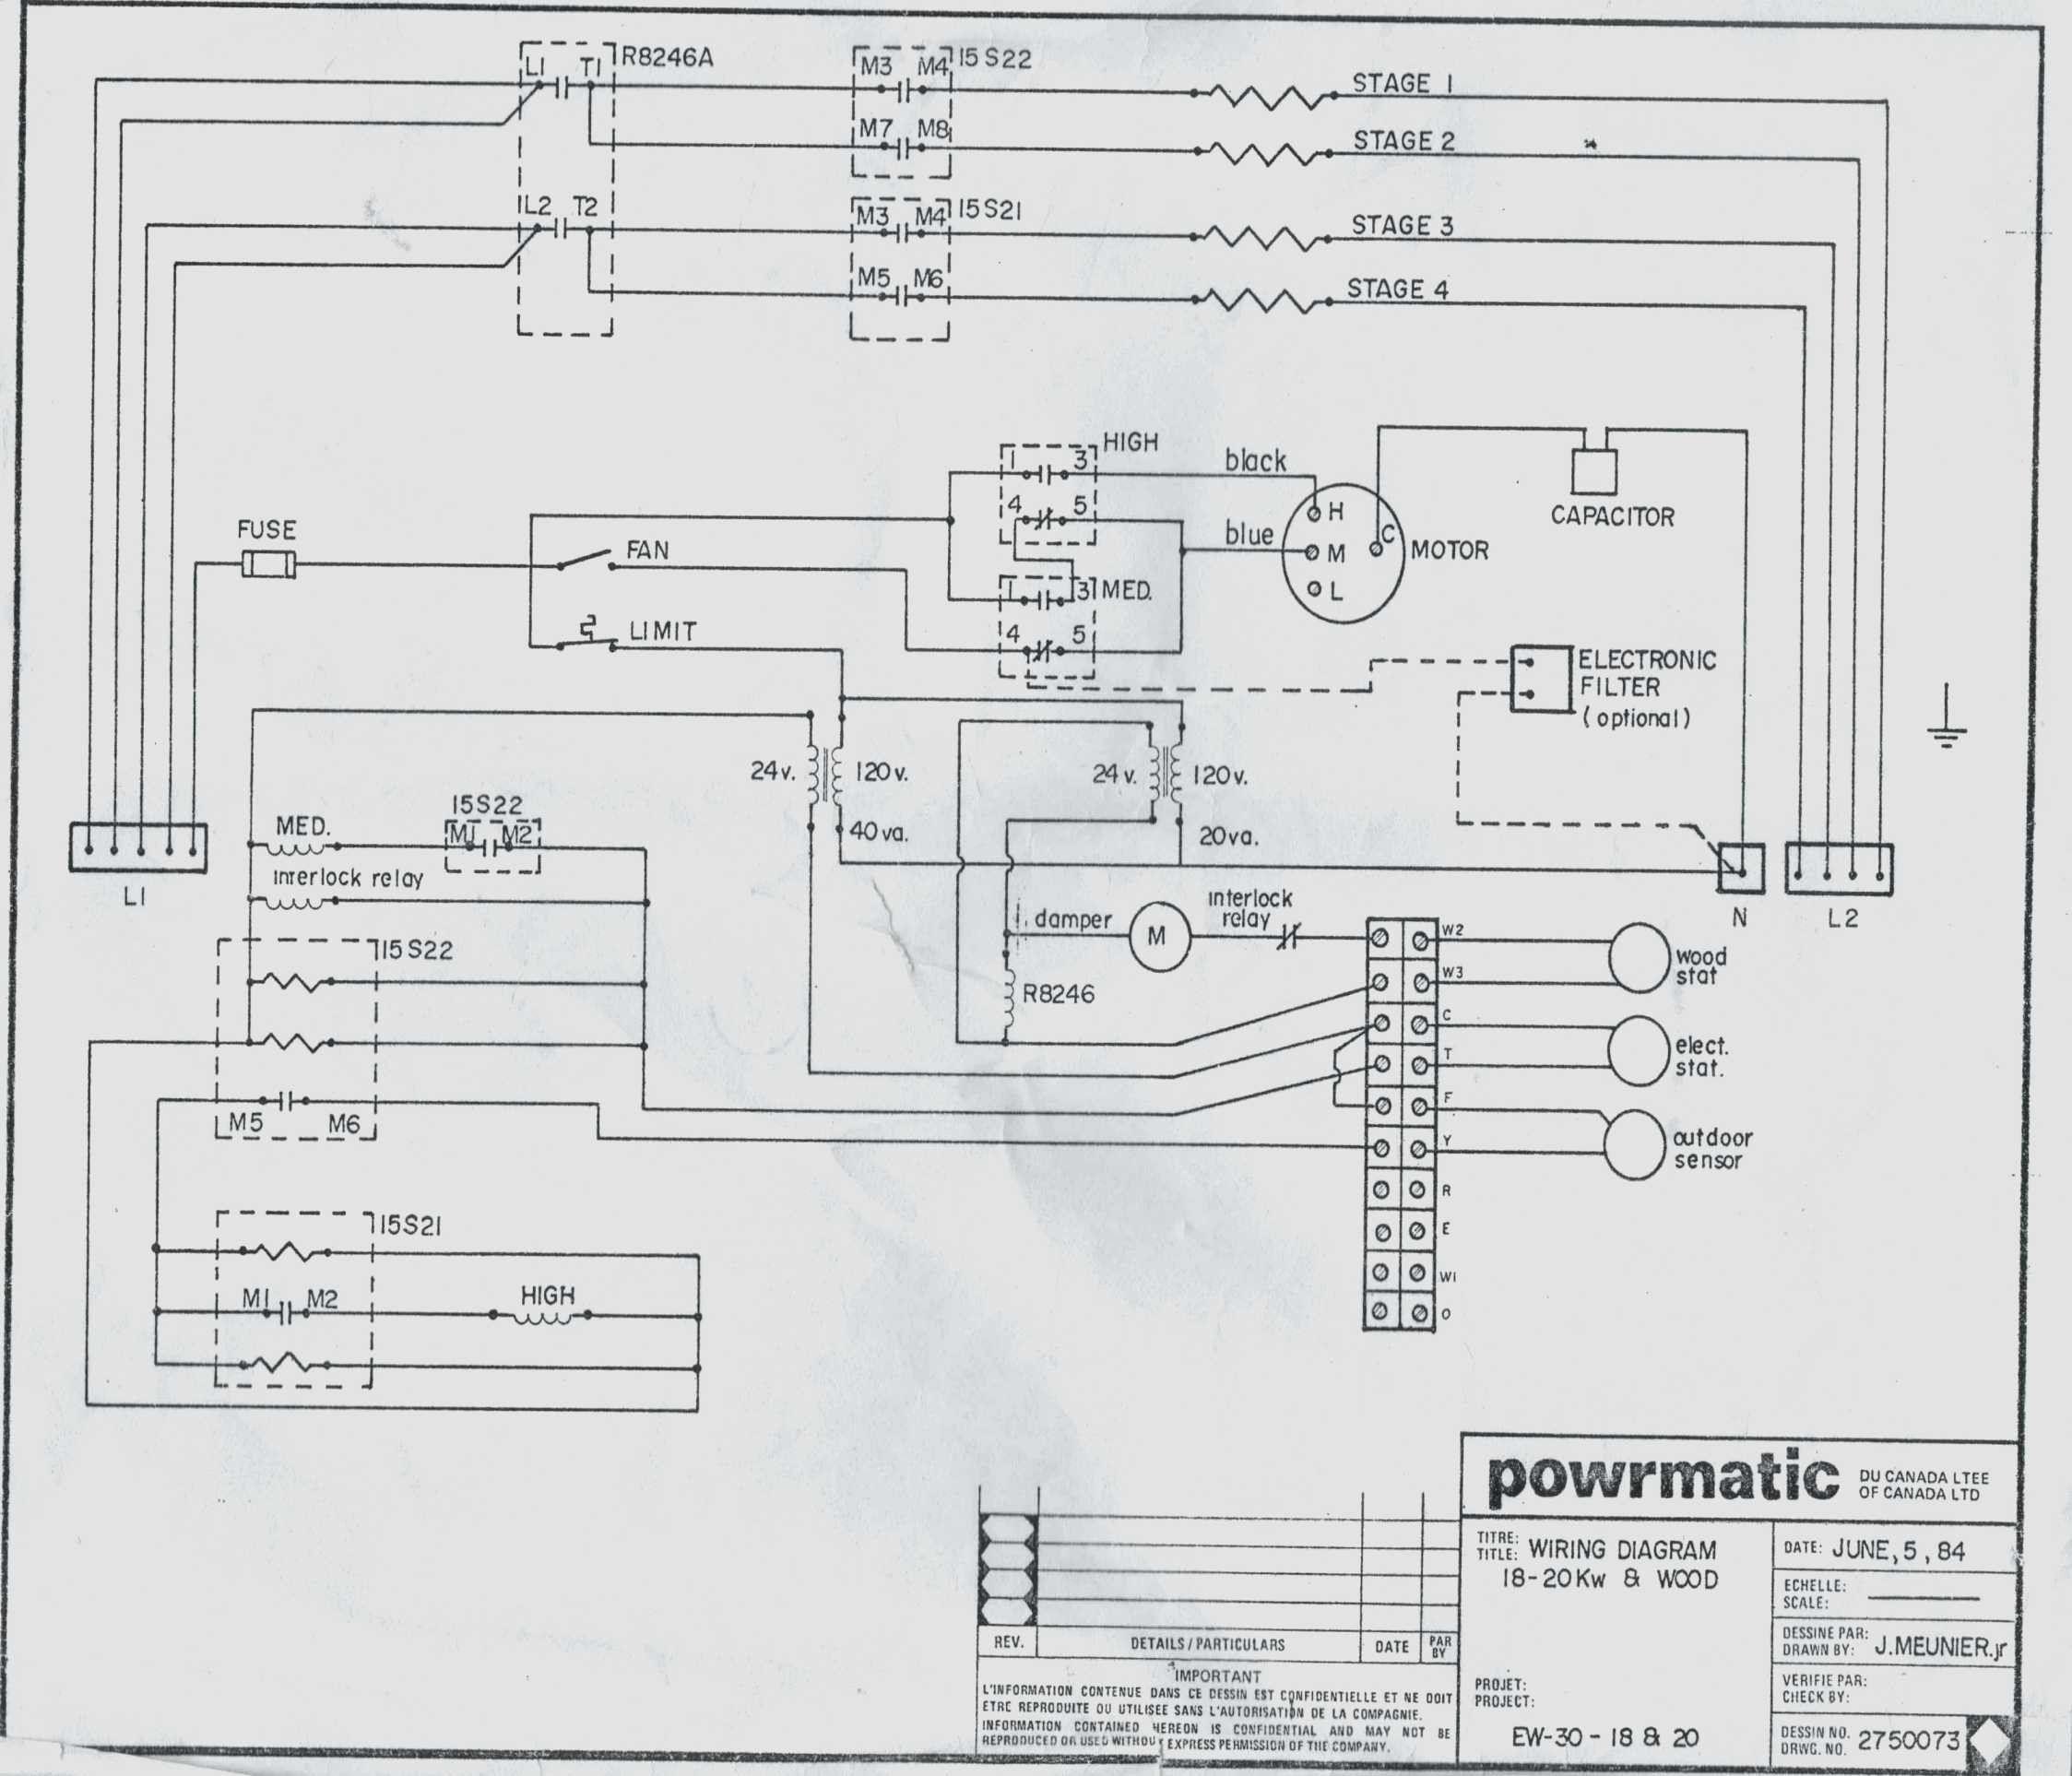 Unique Wiring Diagram For 220 Volt Baseboard Heater Baseboard Heater Diagram Baseboards